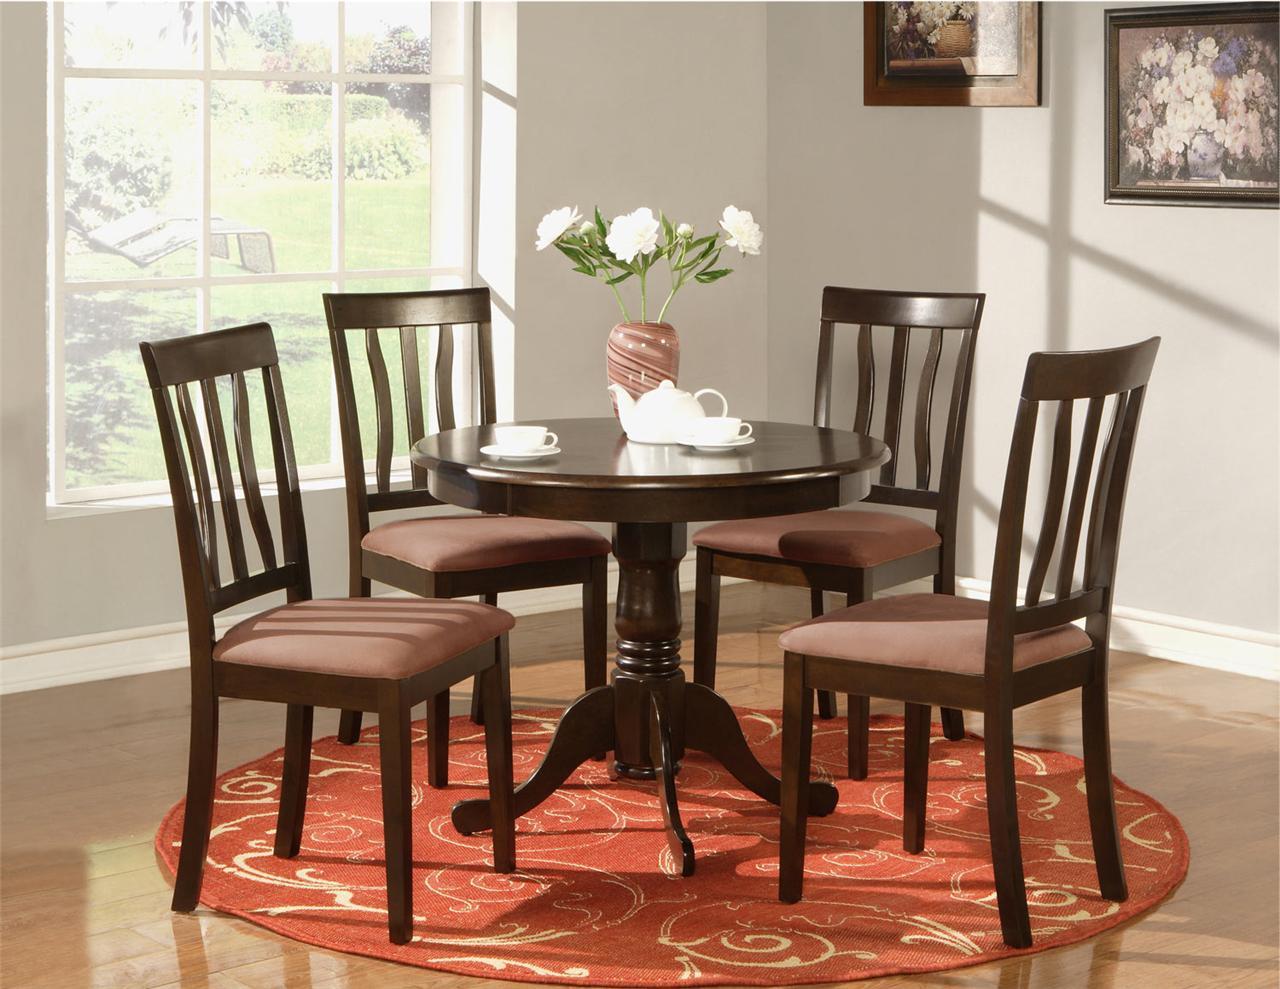 4 kitchen chairs best nursing 5 pc round table dinette and ebay